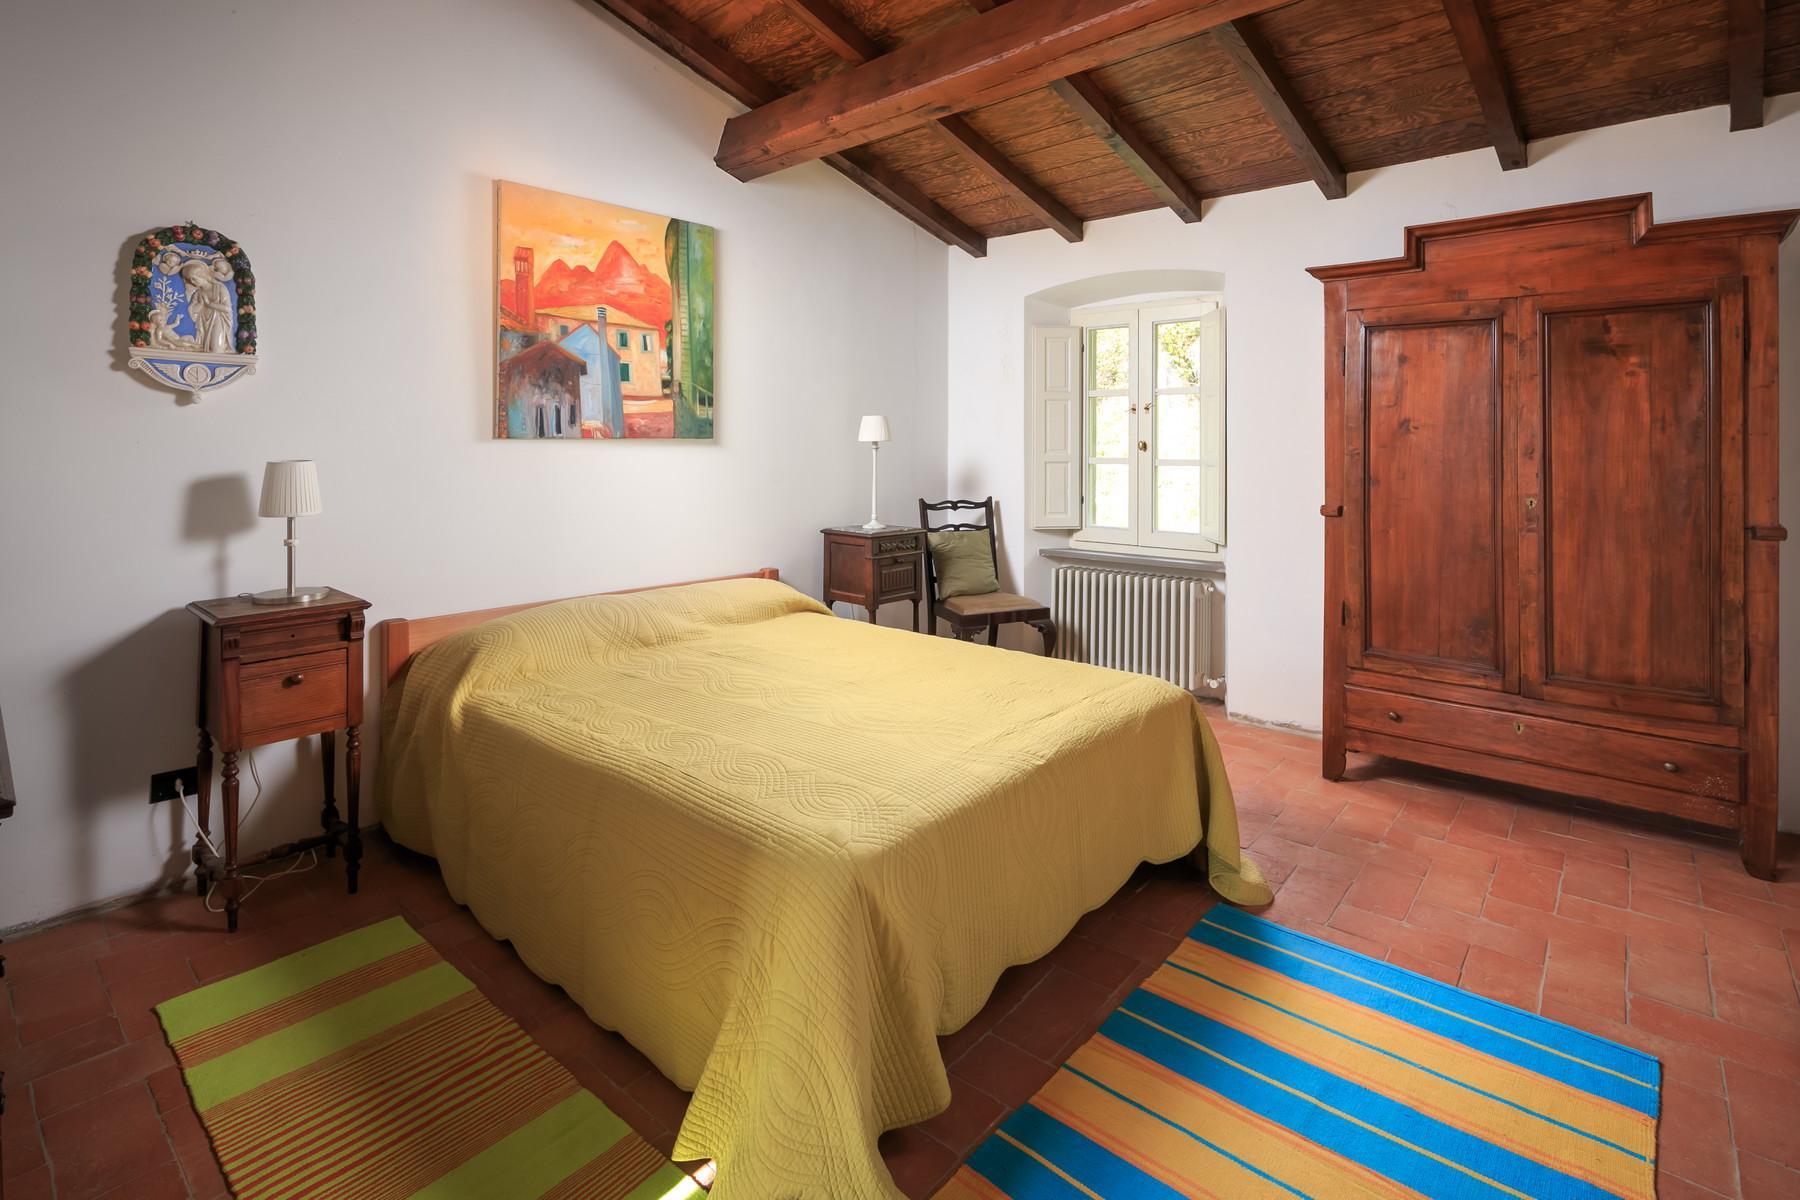 Splendid villa among the hills of Lucca - 16